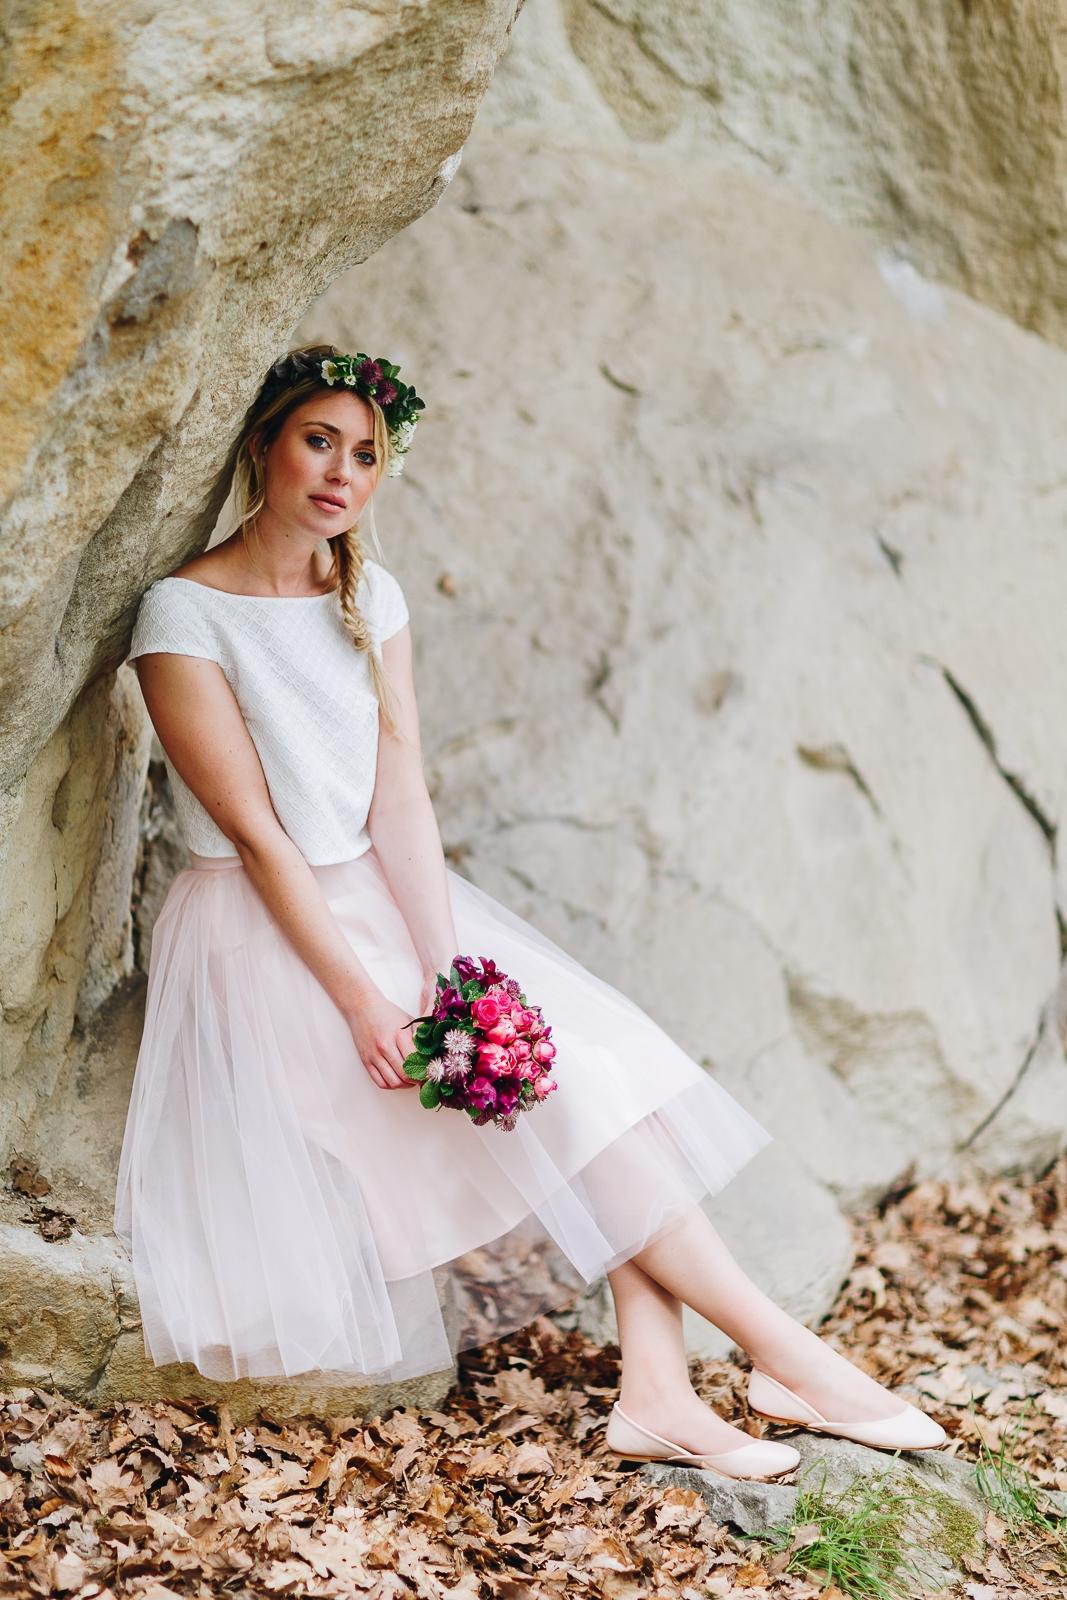 Brautkleid Maeli Brautkleid Mit Tullrock Und Braut Bluse Noni